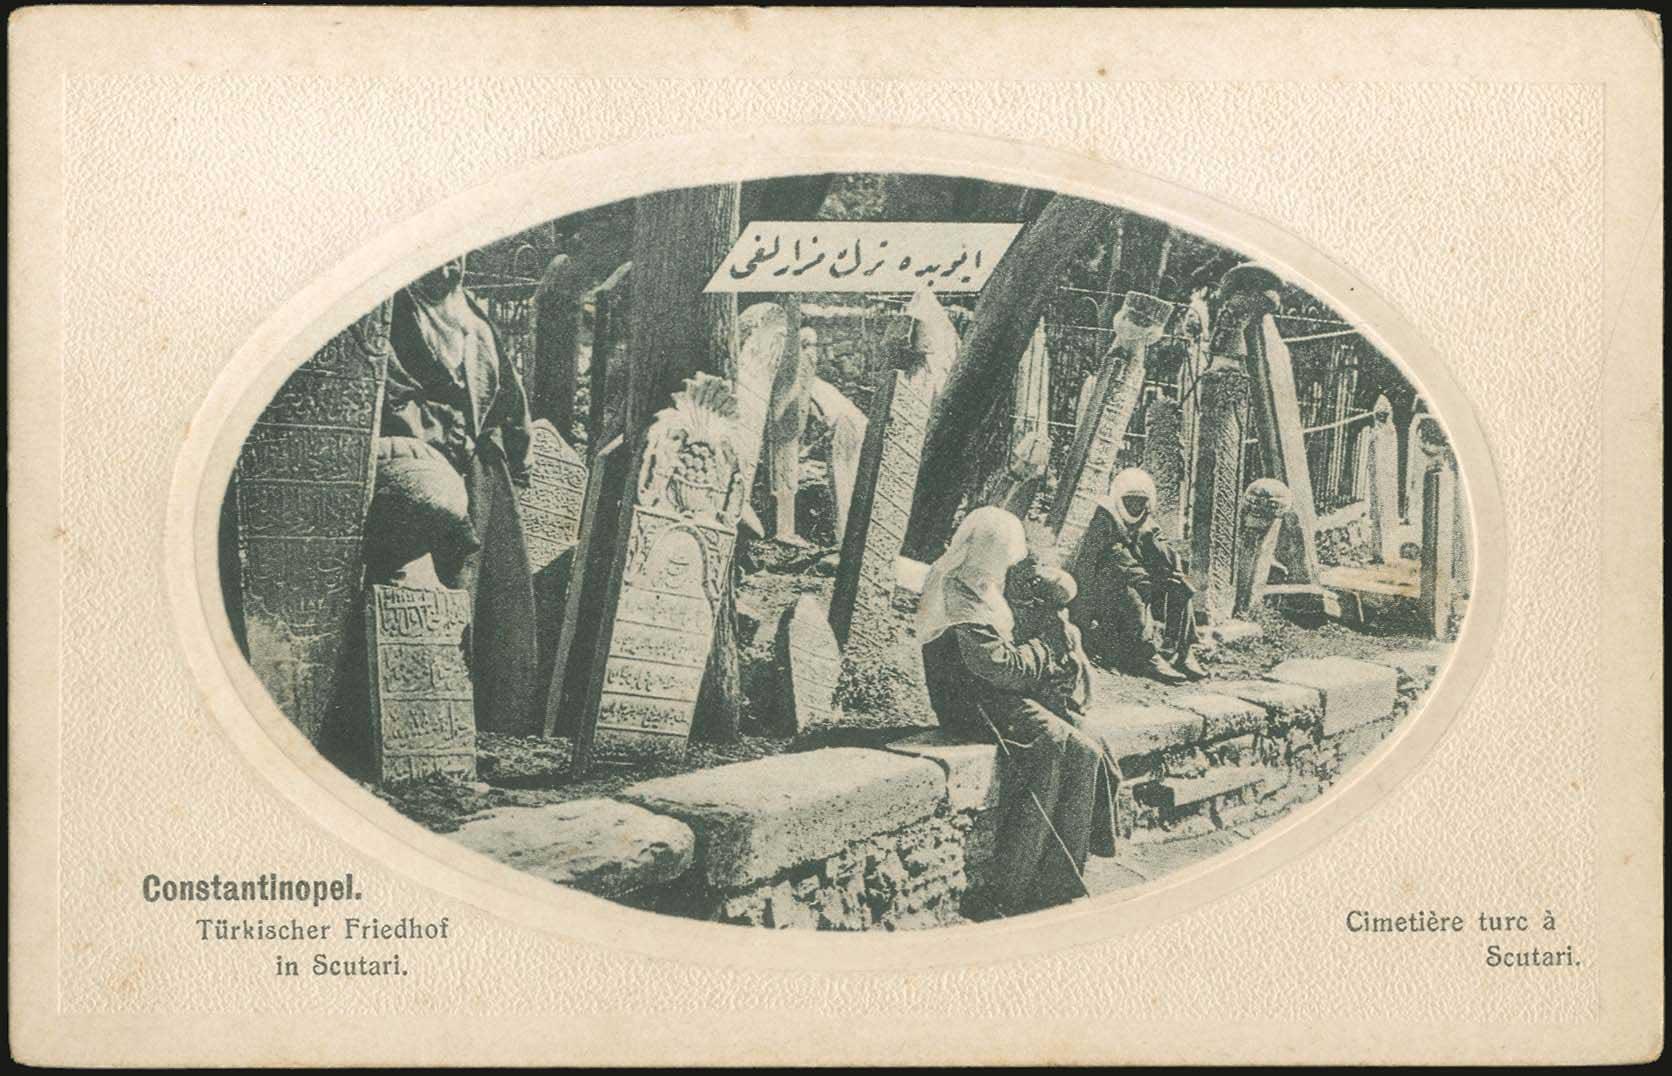 Lot 1763 - -  PICTURE POSTCARDS SMYRNE, CONSTANTINOPLE, ASIA MINOR -  A. Karamitsos Public & Live Internet Auction 675